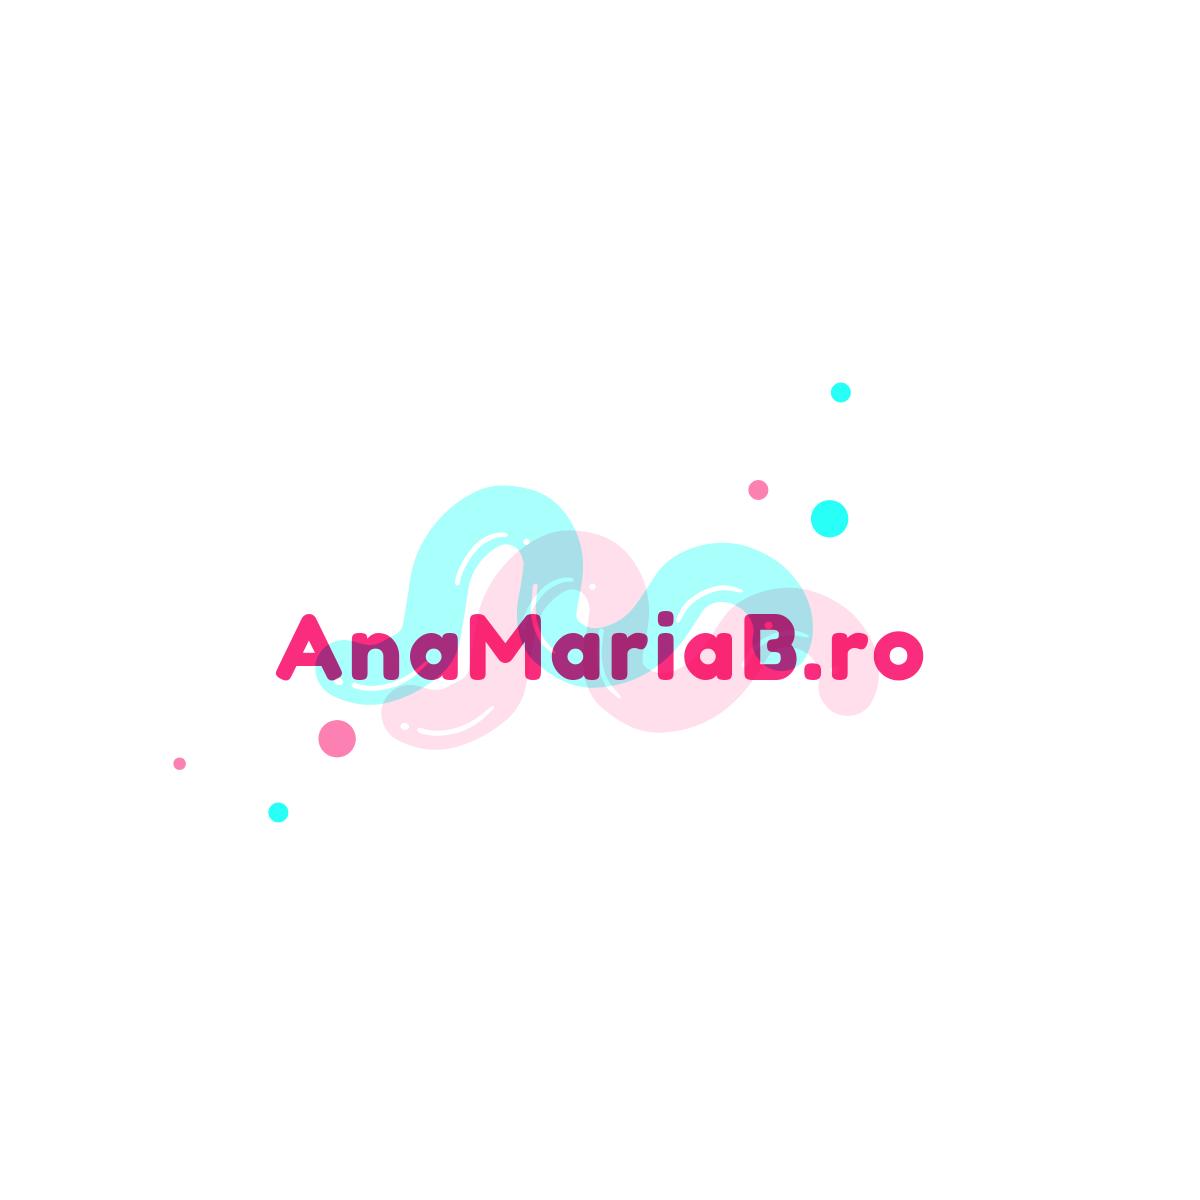 Anamariab